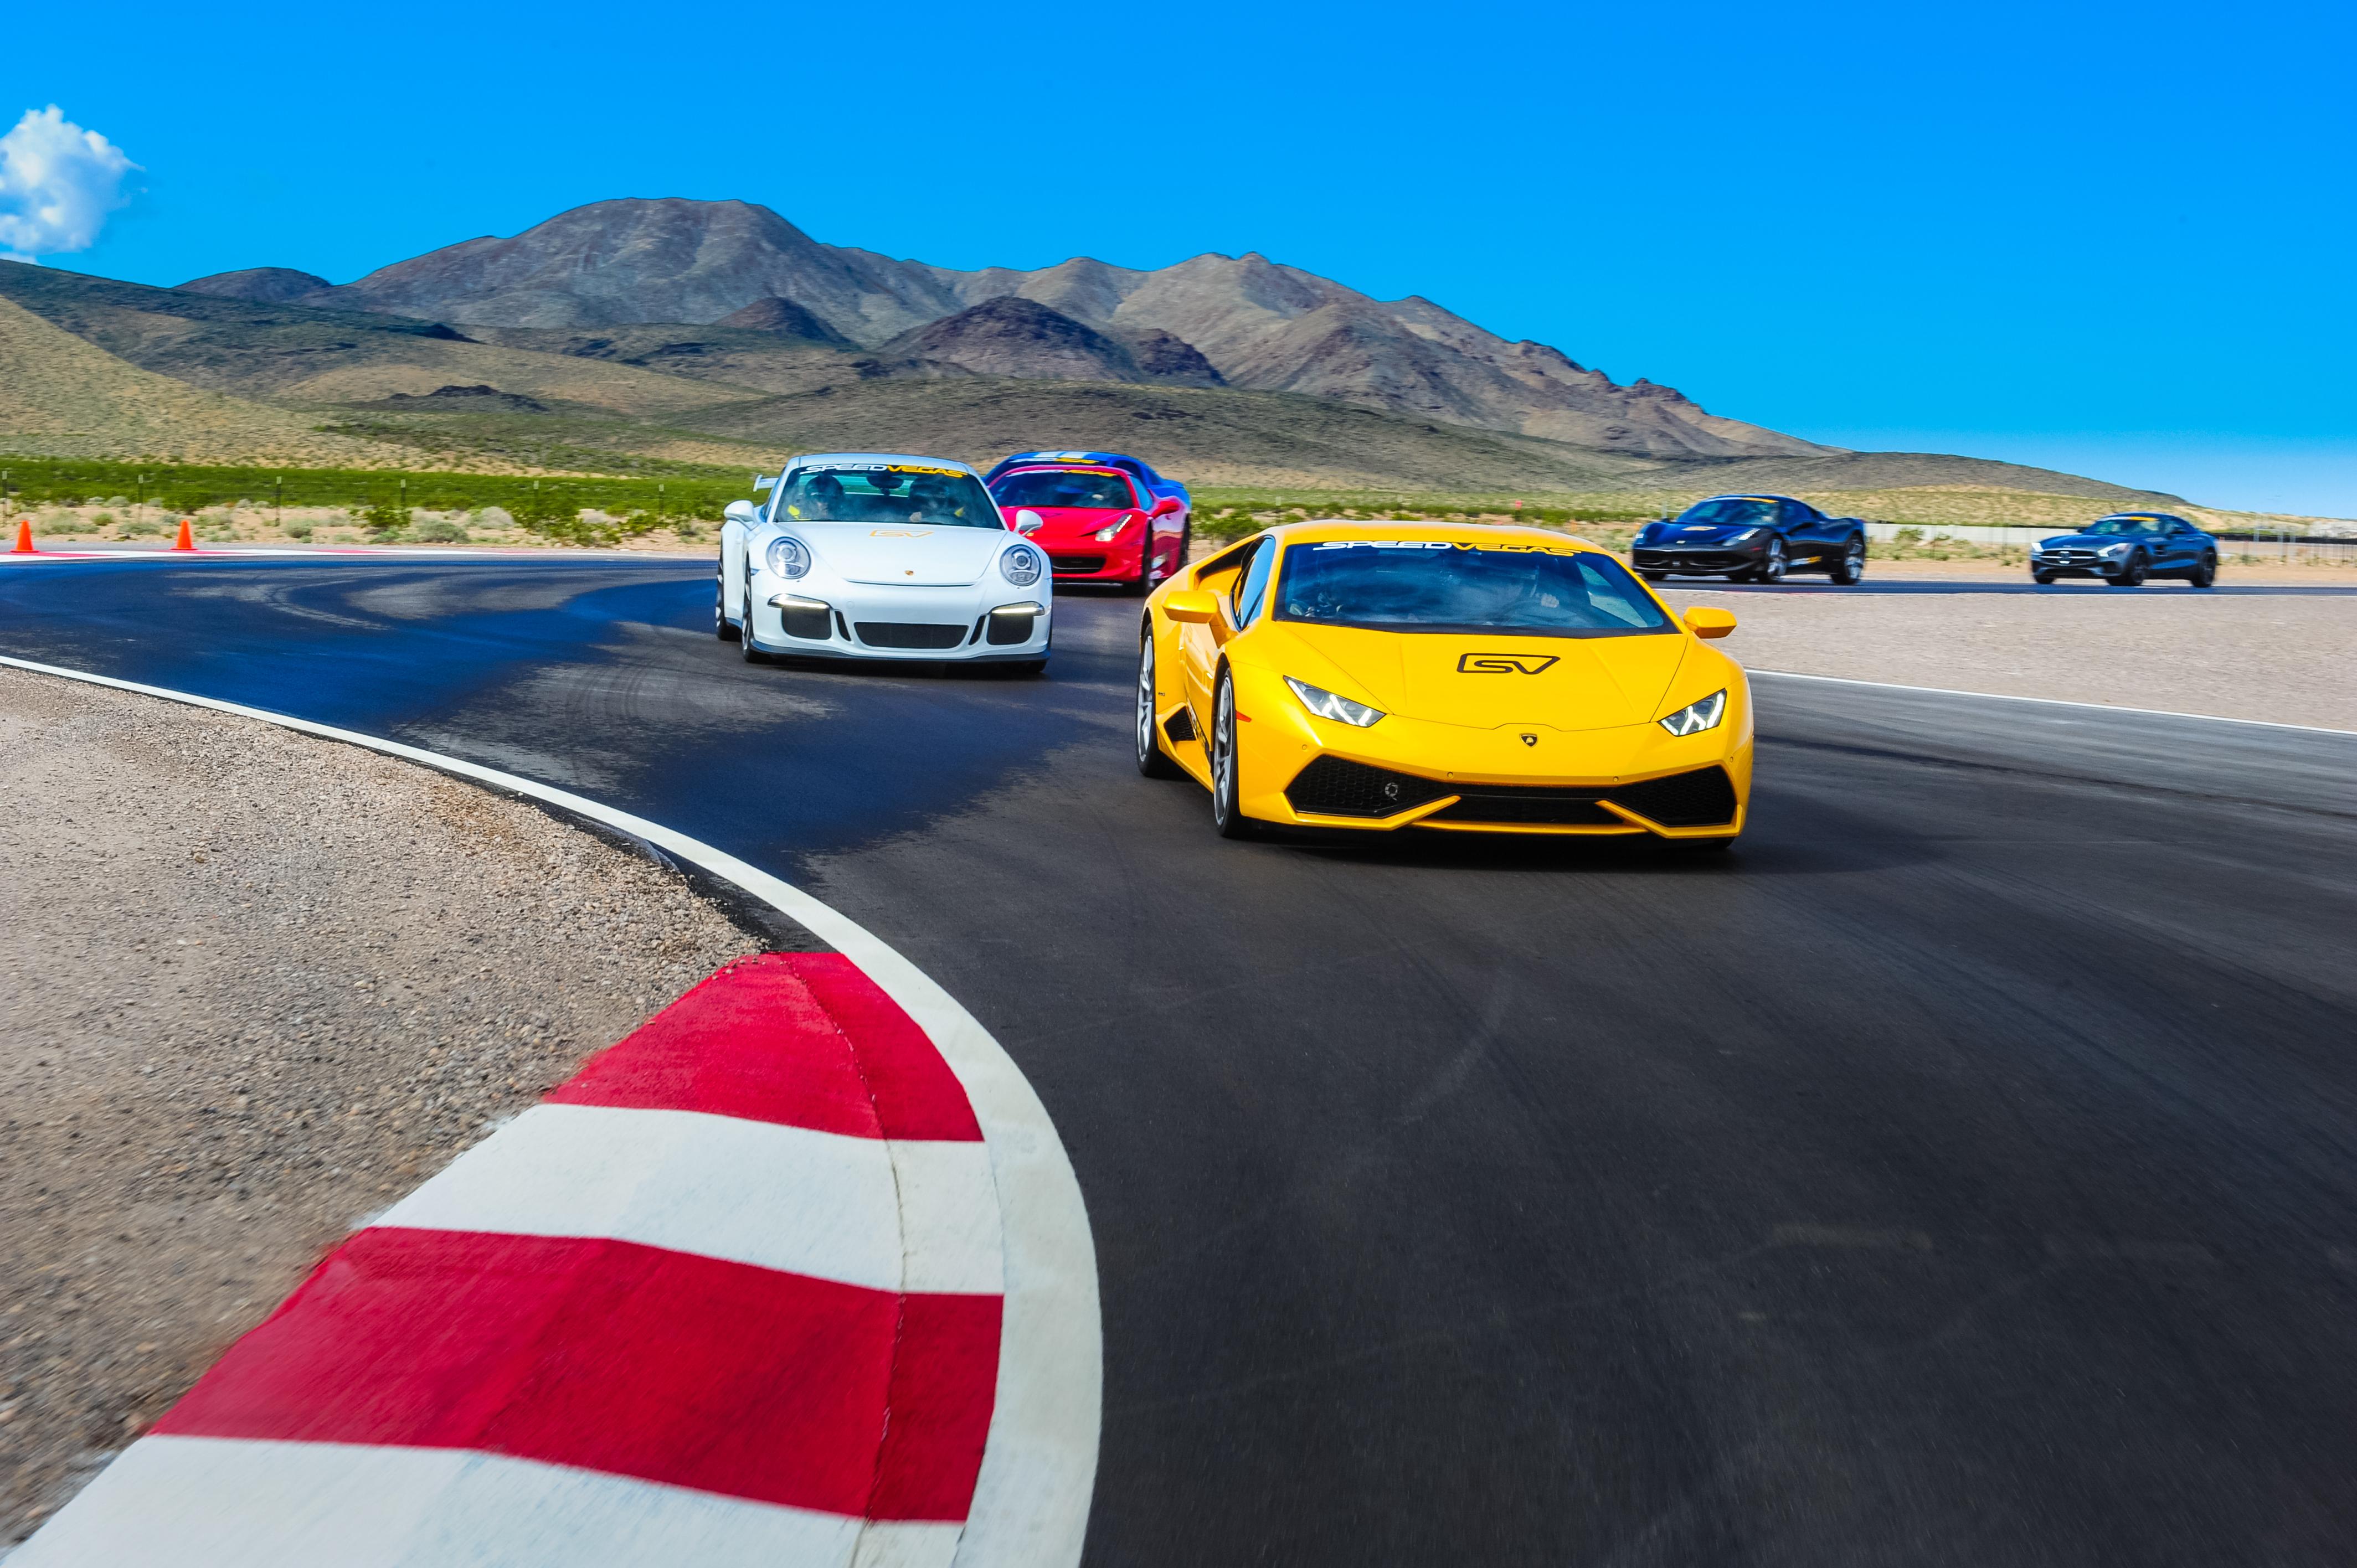 Lamborghini Huracan on Track